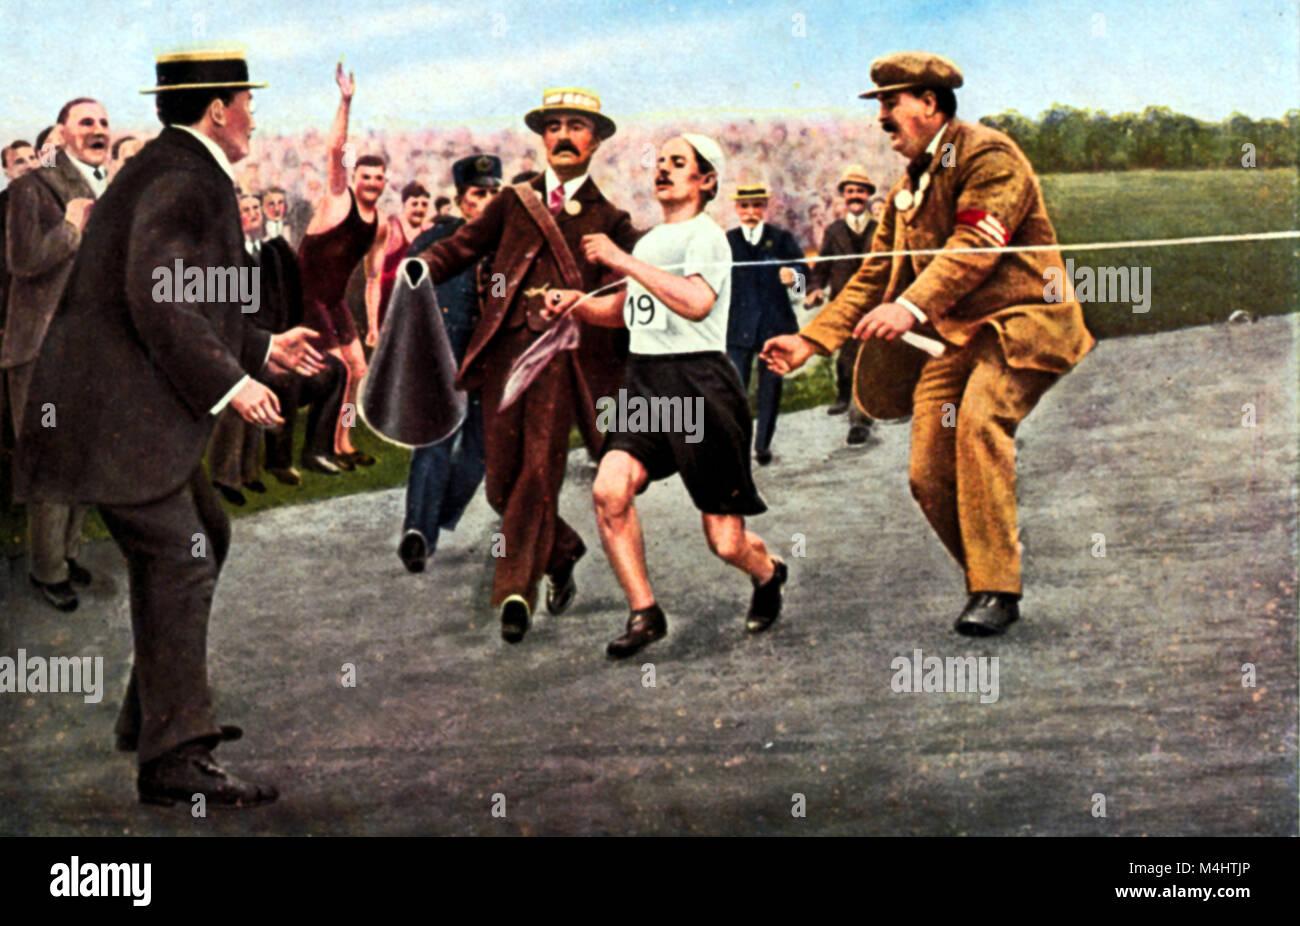 Athletics, Dorando Pietri at the finish, Marathon, Olymic Games 1908 in London, Great Britain Stock Photo